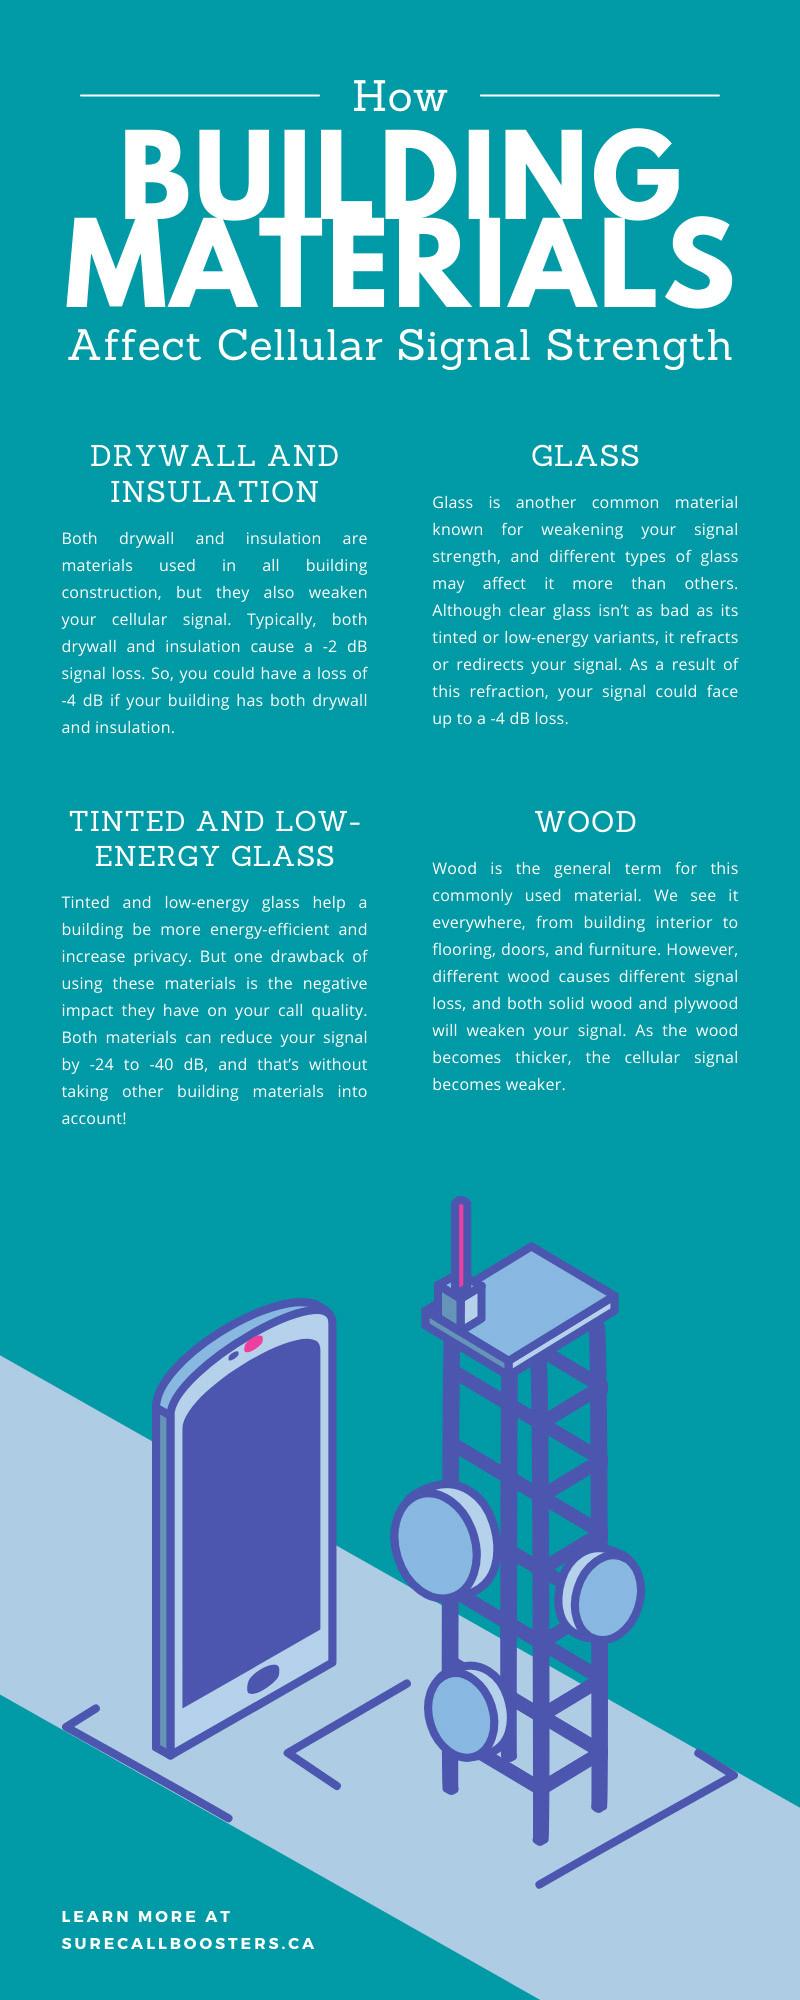 How Building Materials Affect Cellular Signal Strength